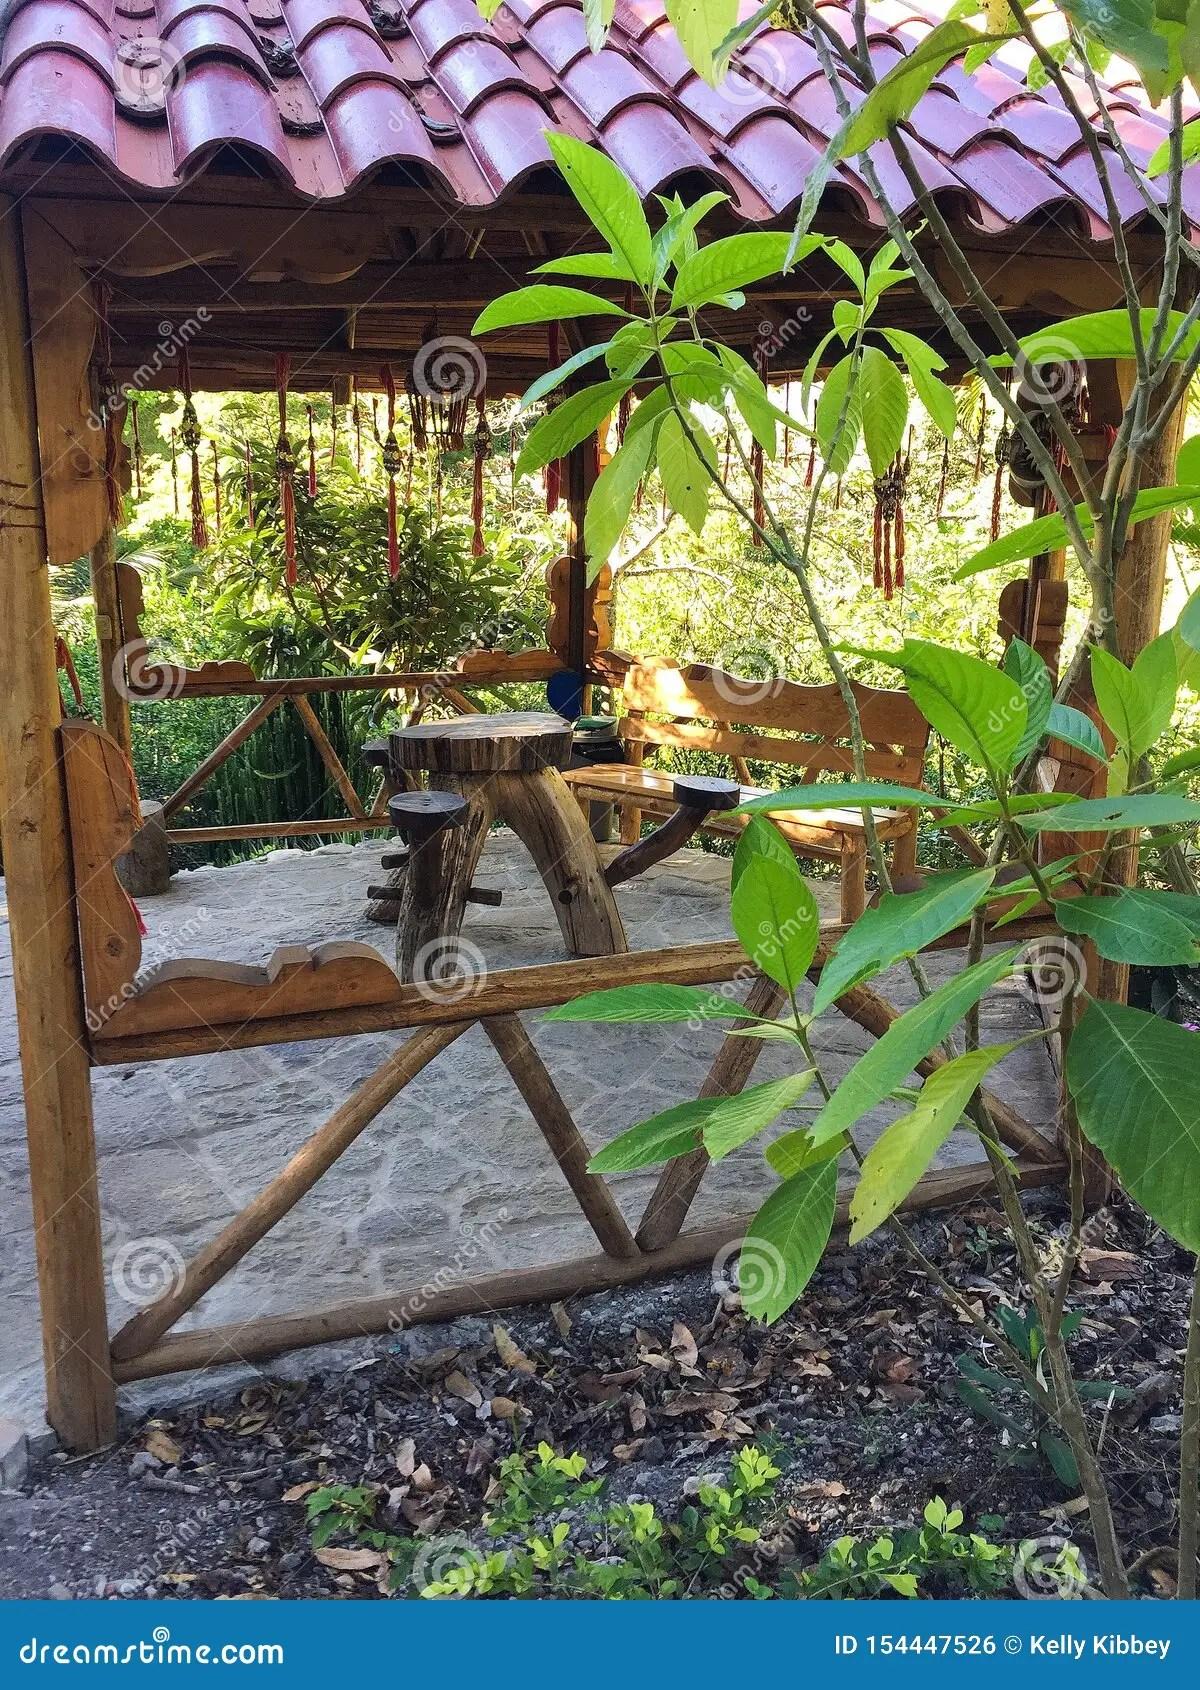 Picnic Table Made Out Of Tree Stump In Gazebo Stock Photo Image Of Picnic Gazebo 154447526